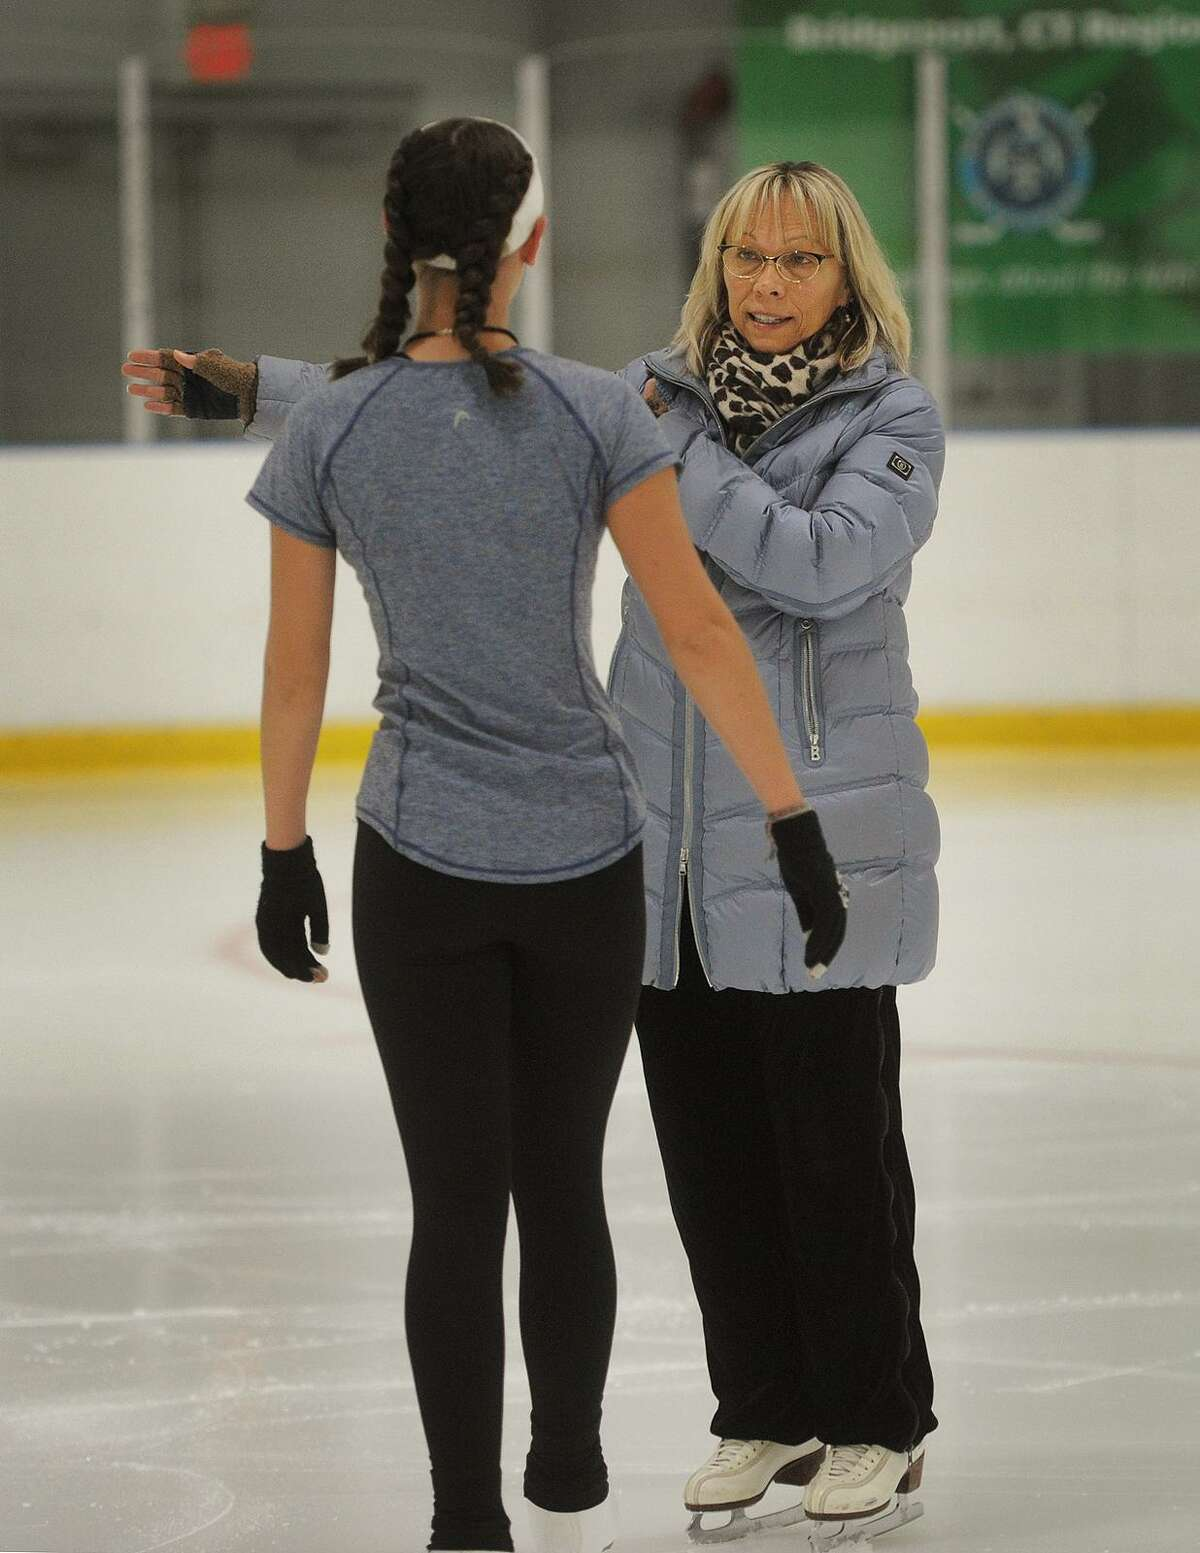 Wonderland of Ice owner and Sacred Heart University figure skating coach Lisa Fedick works with skater Alexa Rodrigues at the rink in Bridgeport, Conn. on Thursday, September 27, 2018.